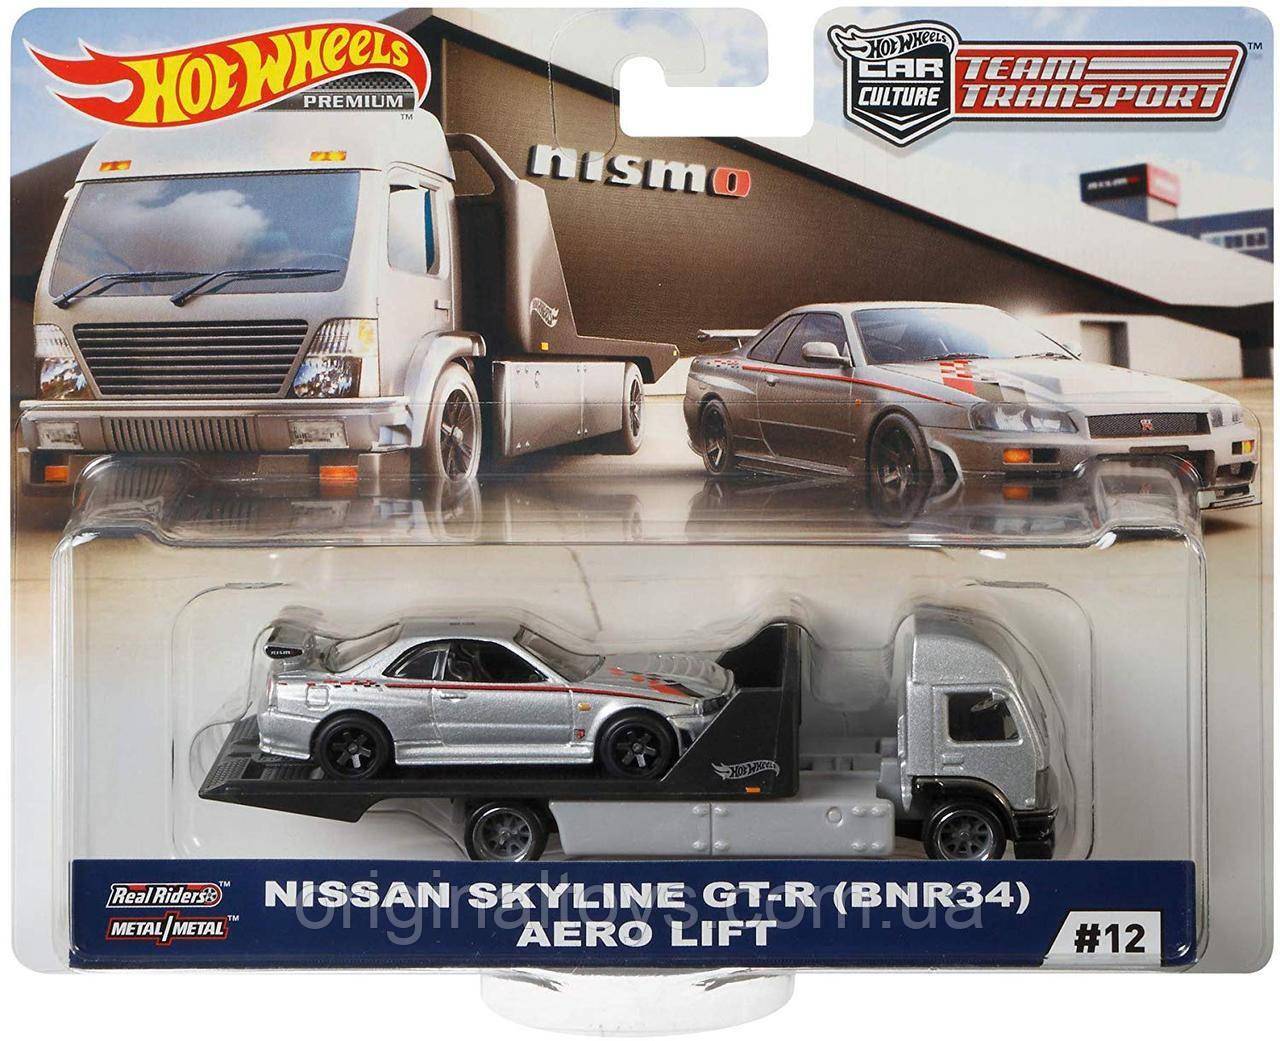 Коллекционные  модели Hot Wheels Nissan Skyline GT-R ( BNR34) aero lift